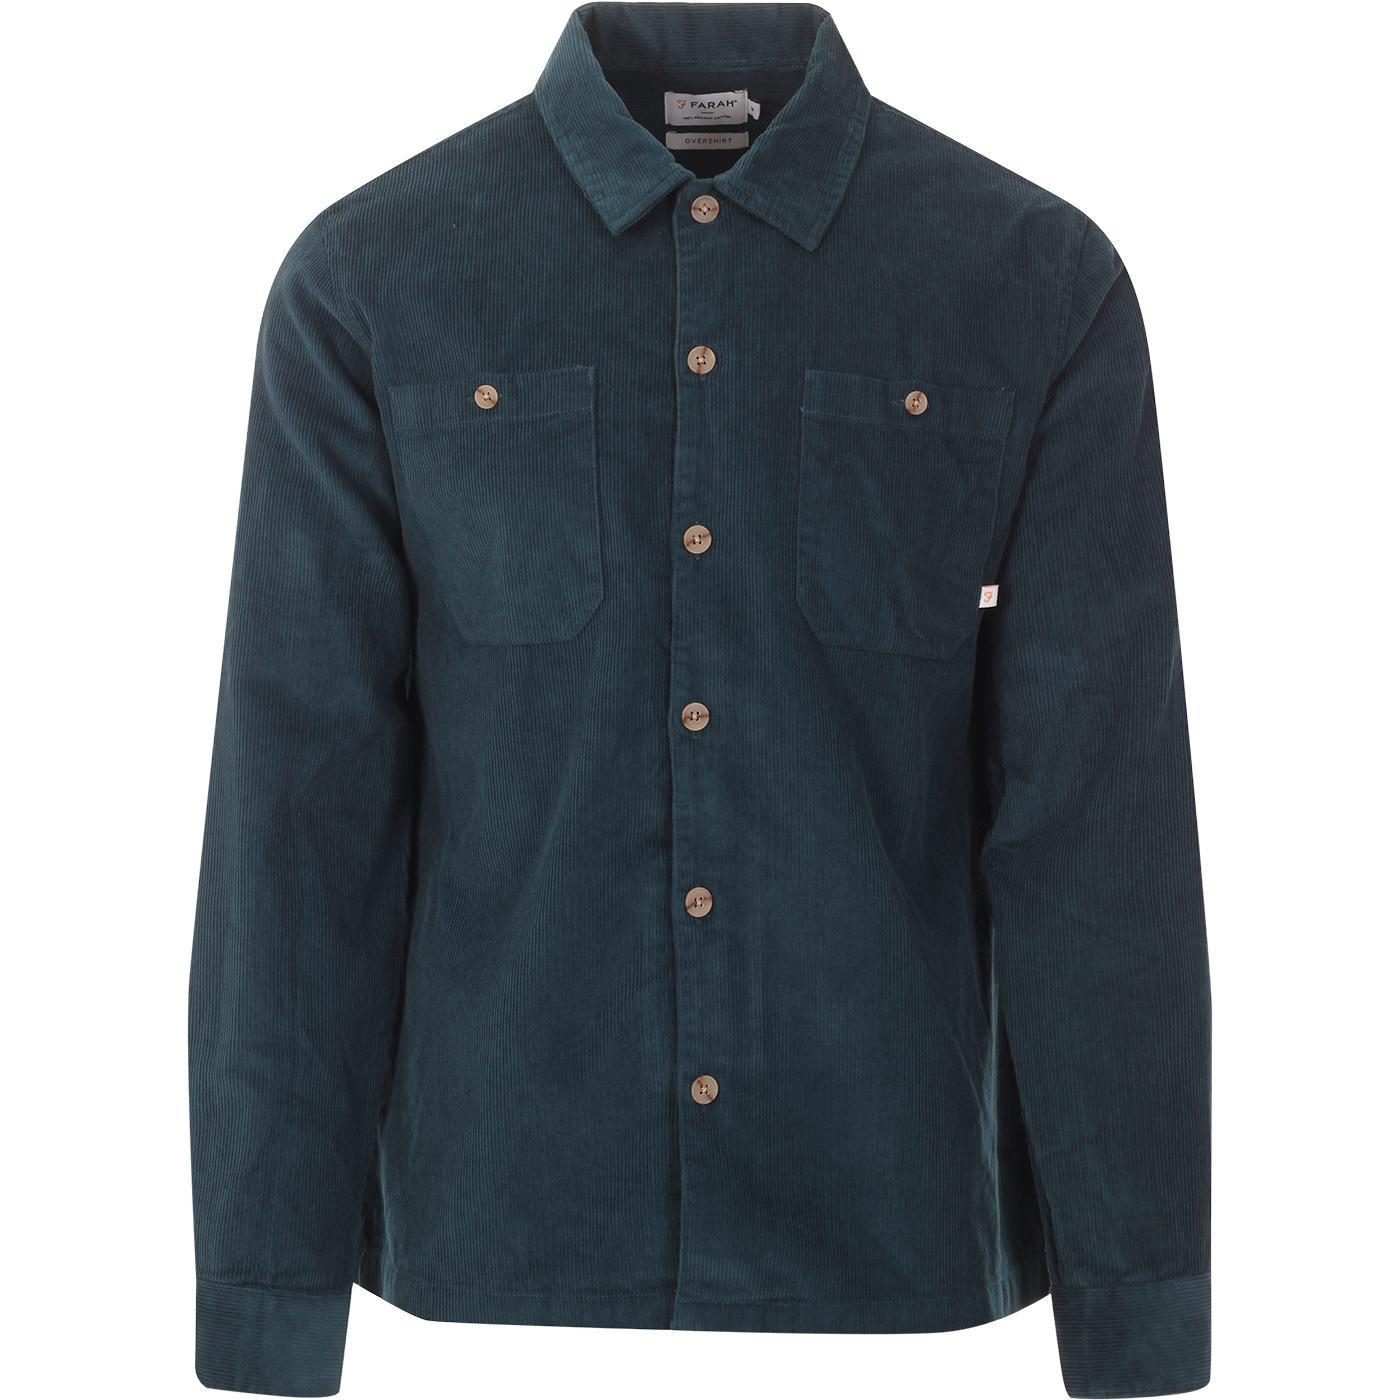 Amberson FARAH Retro Cord Overshirt (Atlantic)